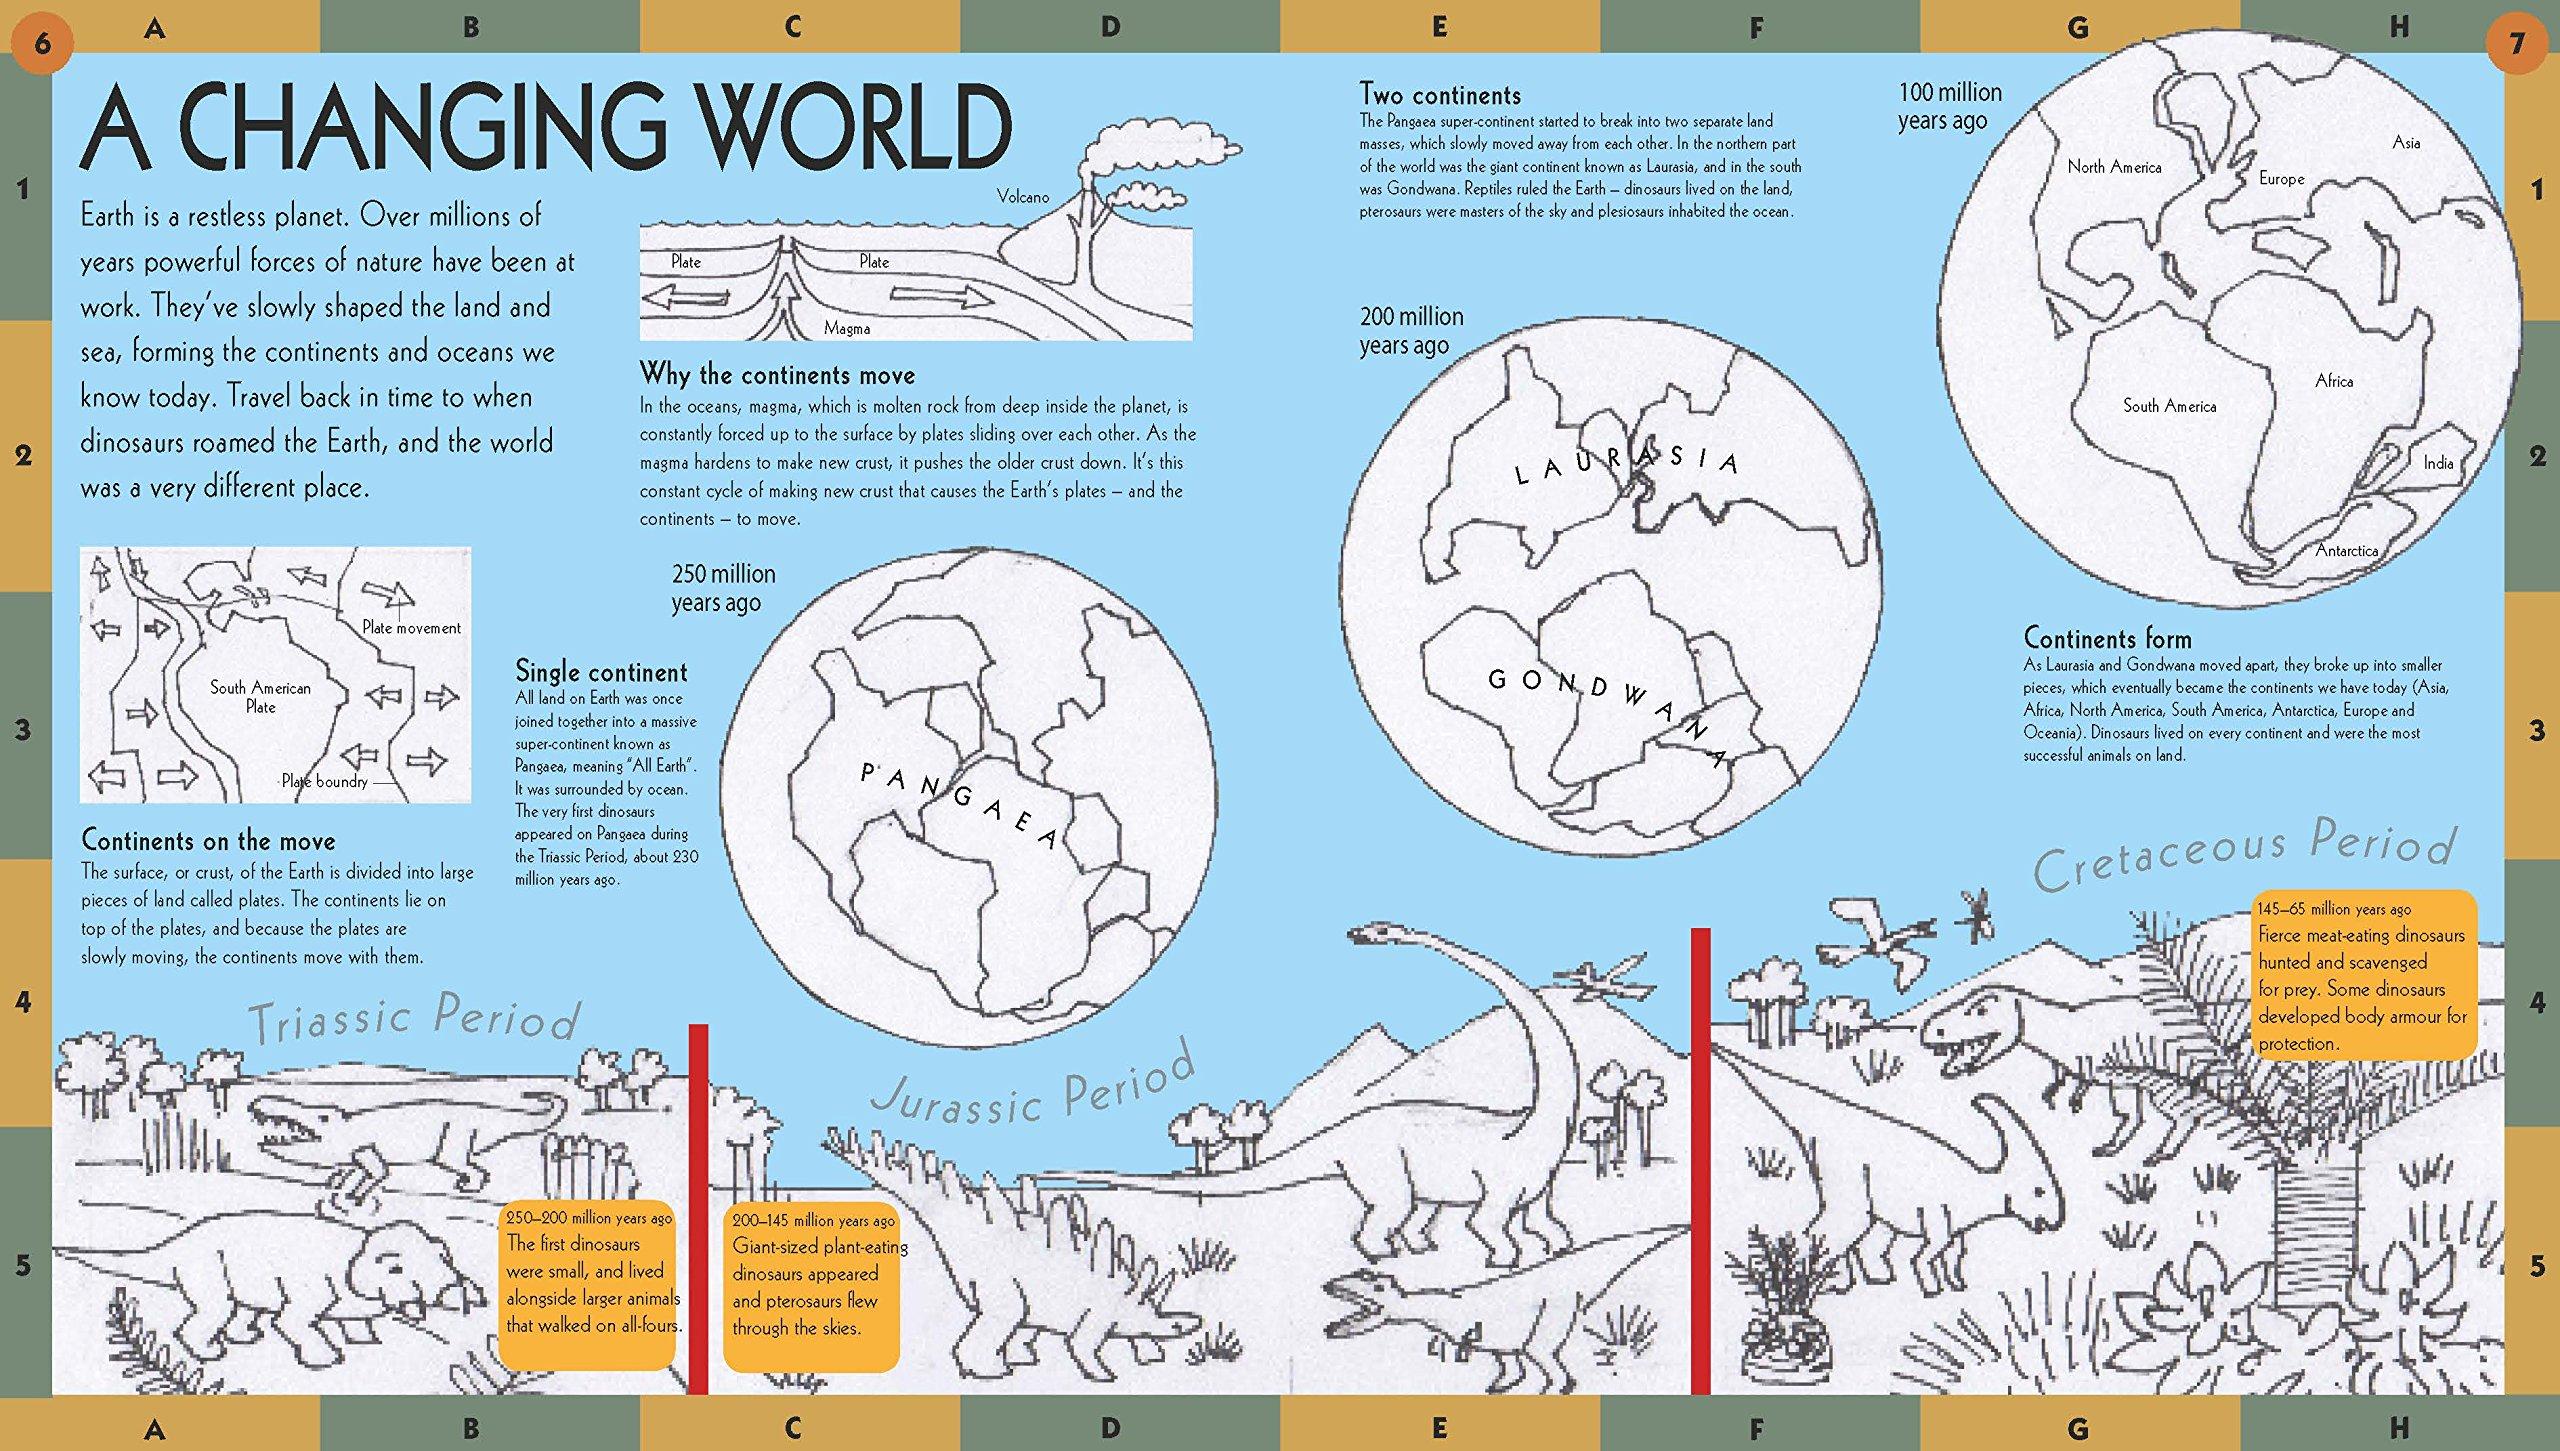 Childrens dinosaur atlas john malam katrin wiehle childrens dinosaur atlas john malam katrin wiehle 9781682971987 amazon books sciox Image collections